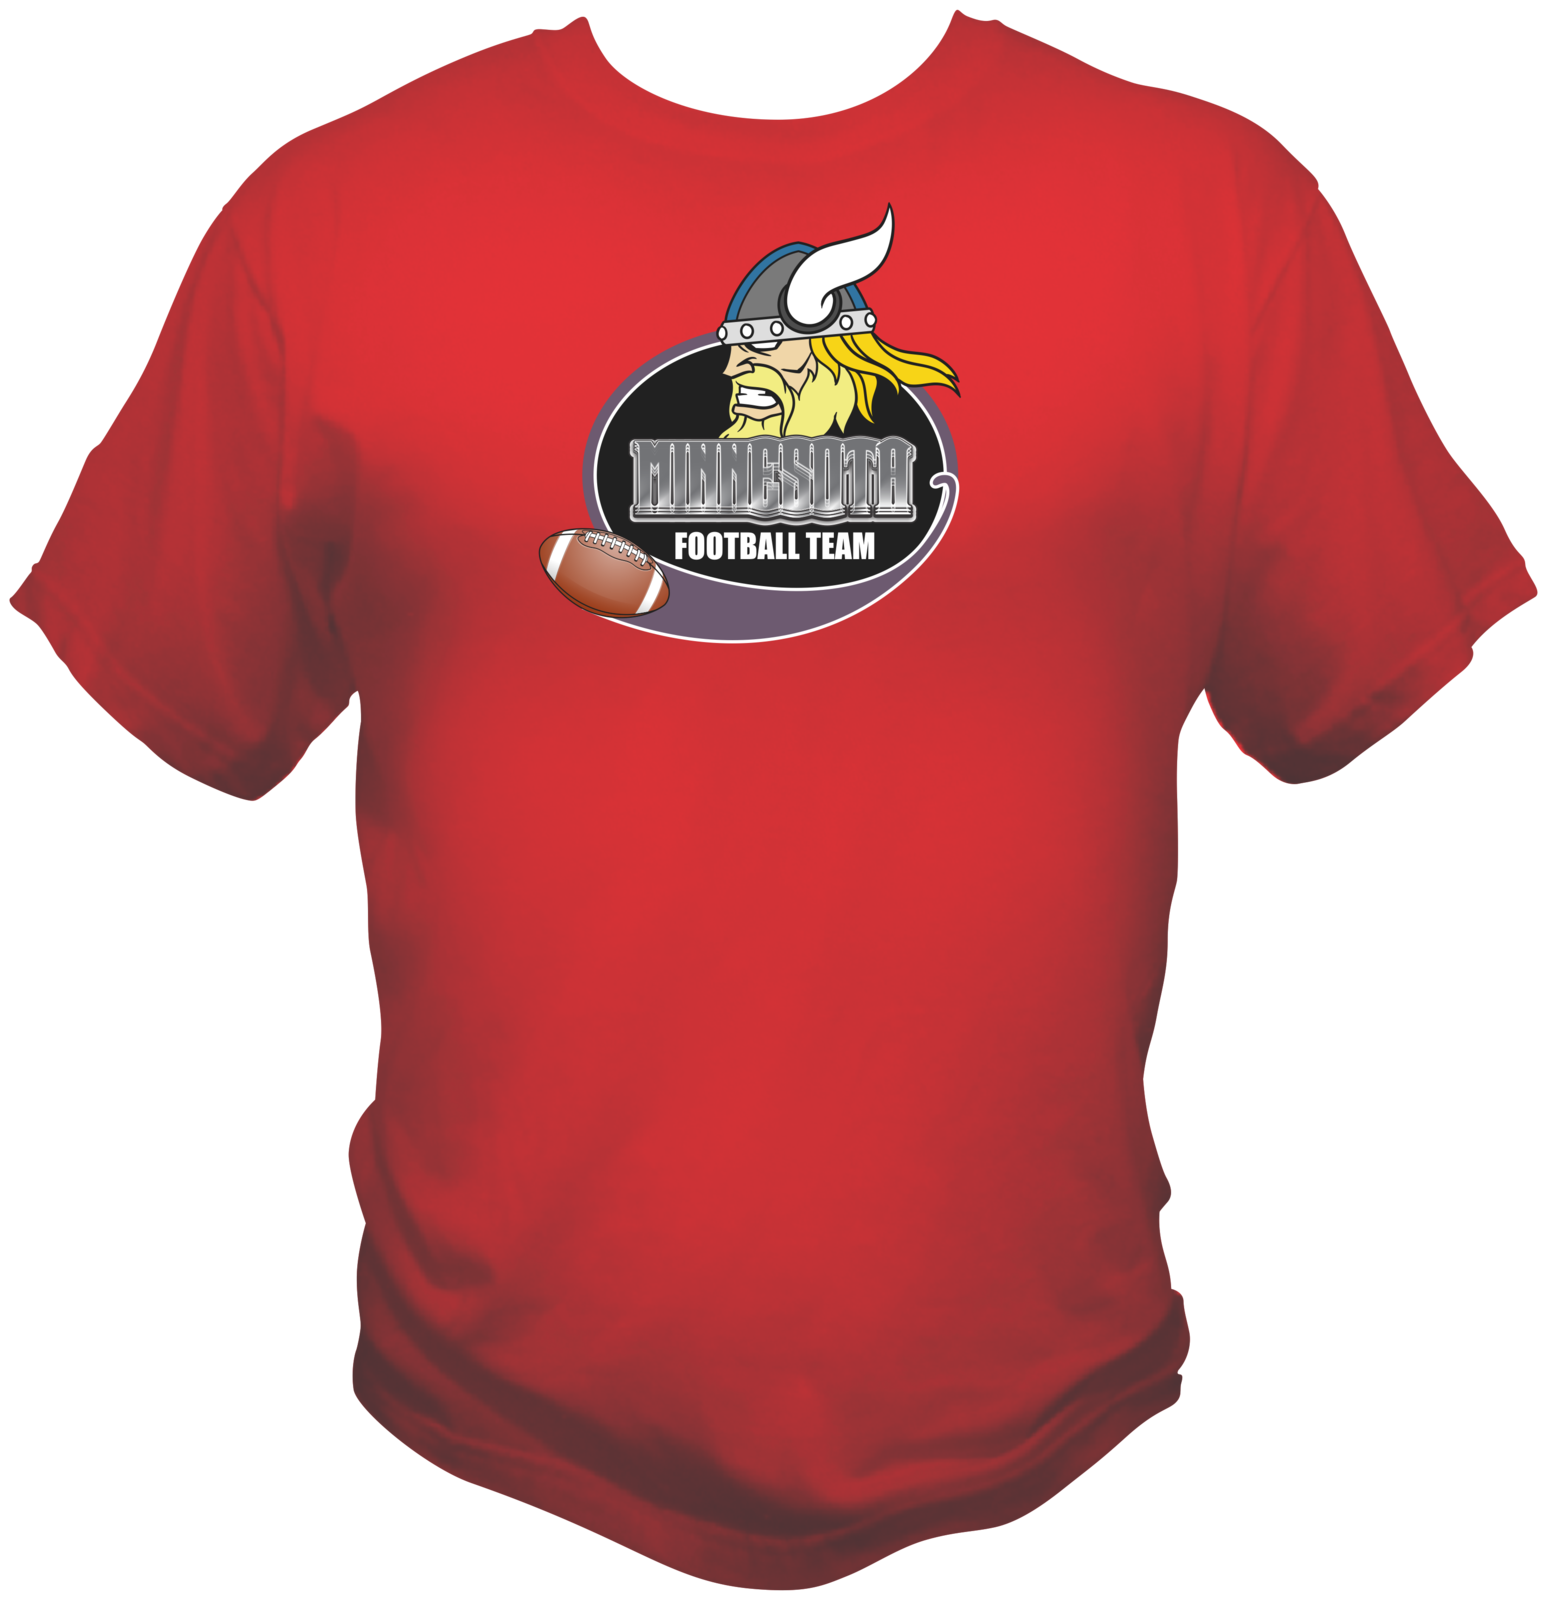 Minnesota Football Team Sports Style Graphic T Shirt Black Red White L XL 2XL